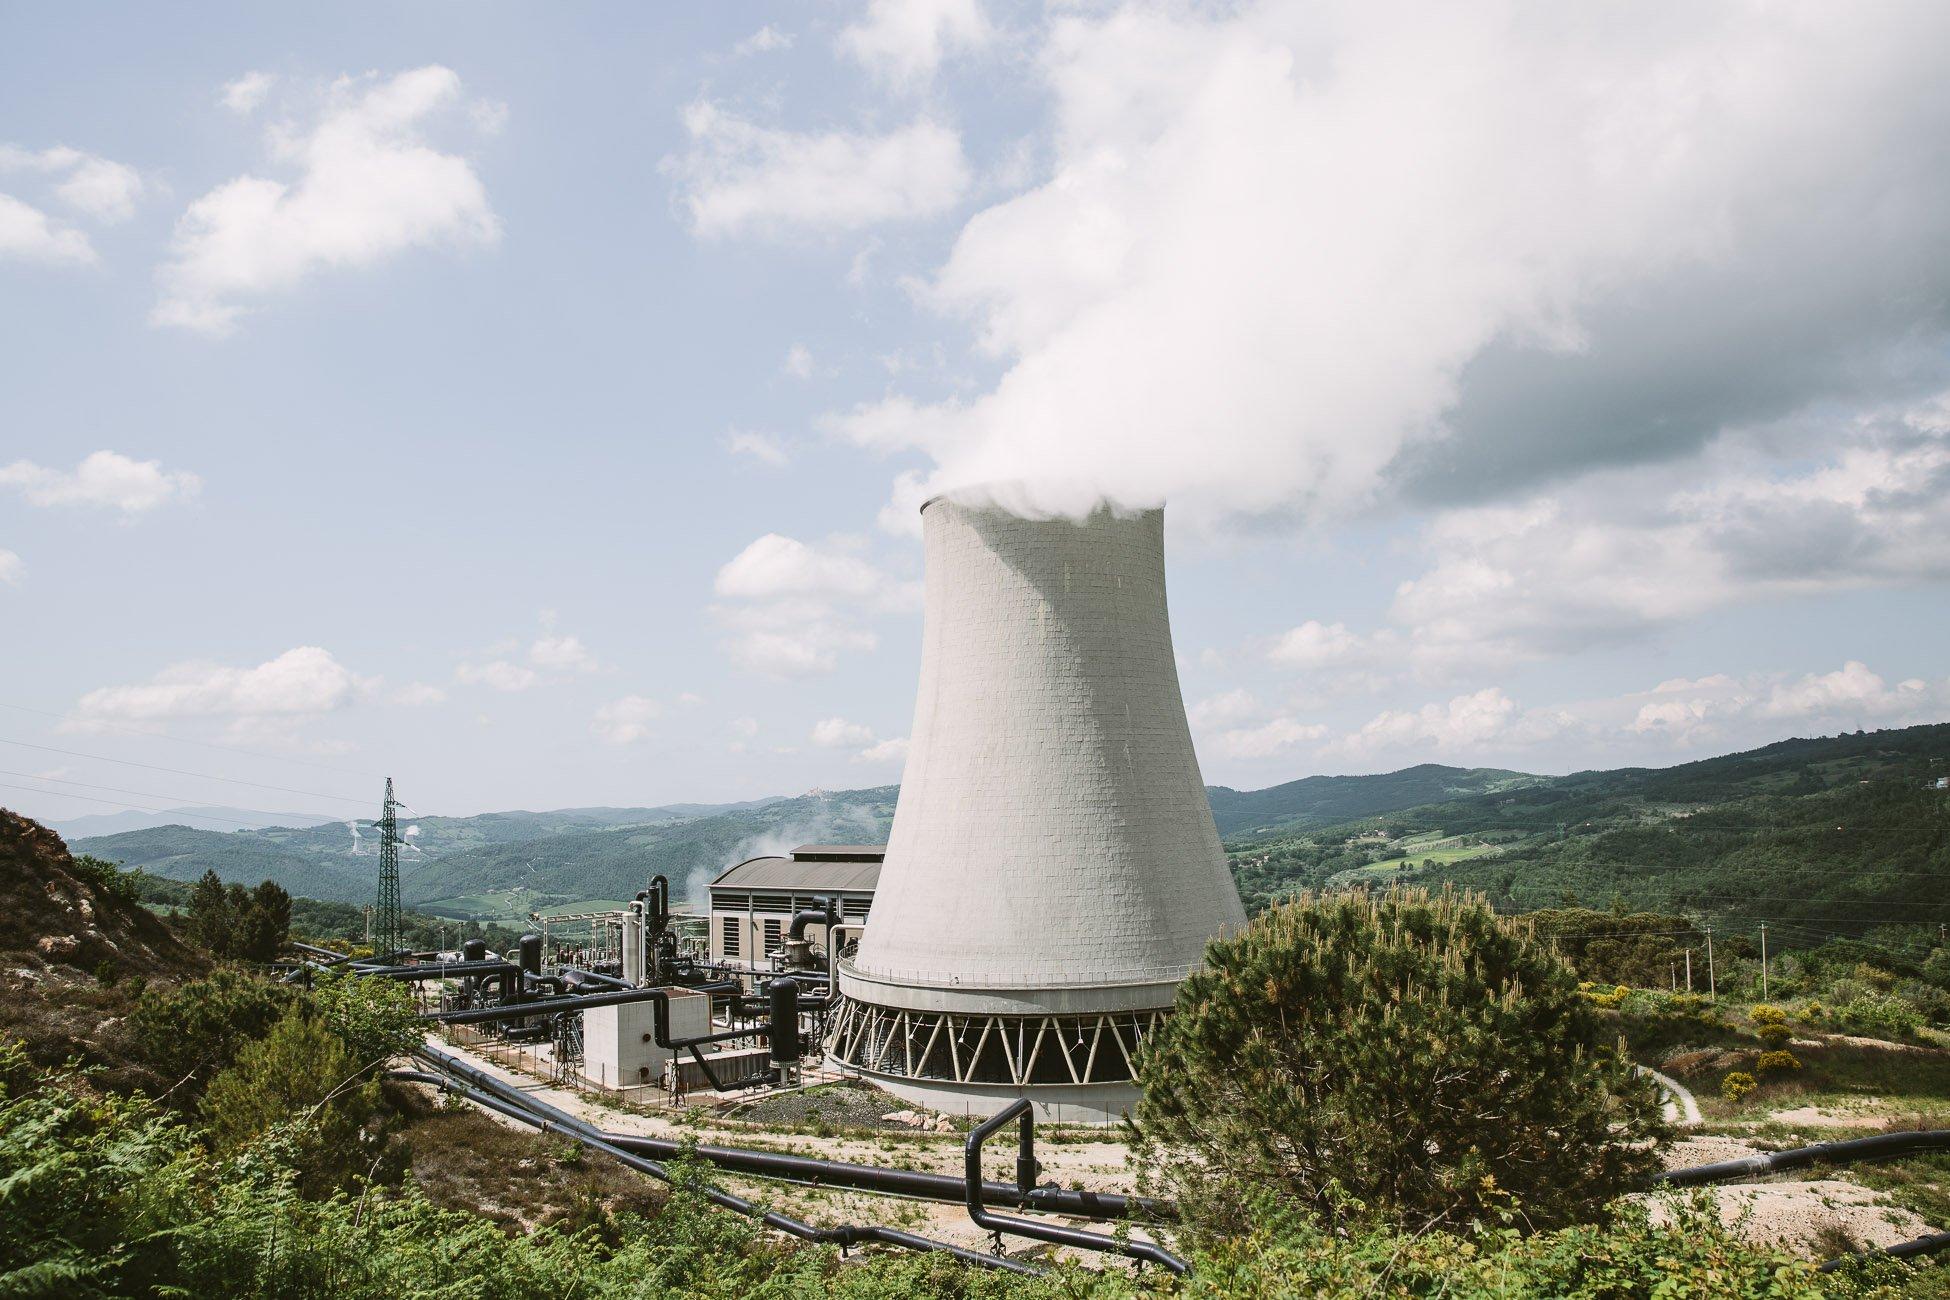 Geothermal power plant in Larderello Pomarance